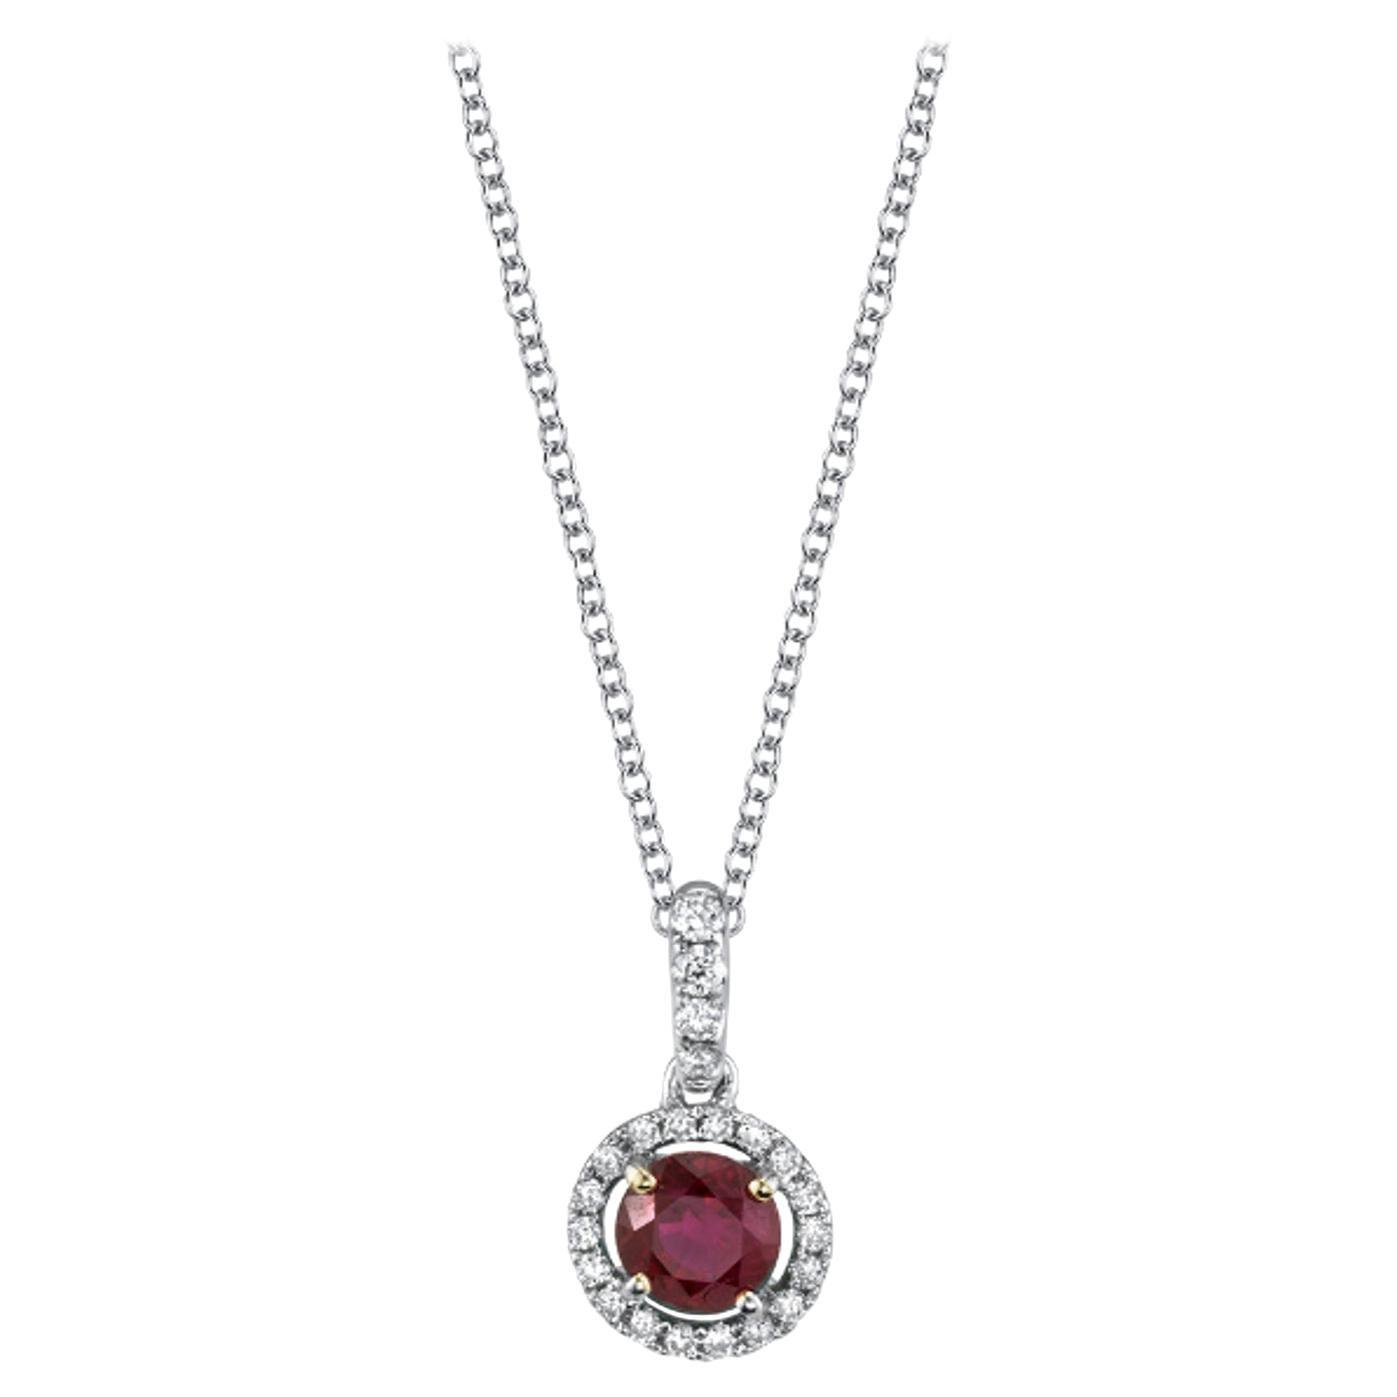 .68 Carat Ruby and Diamond 18k White Gold Pendant